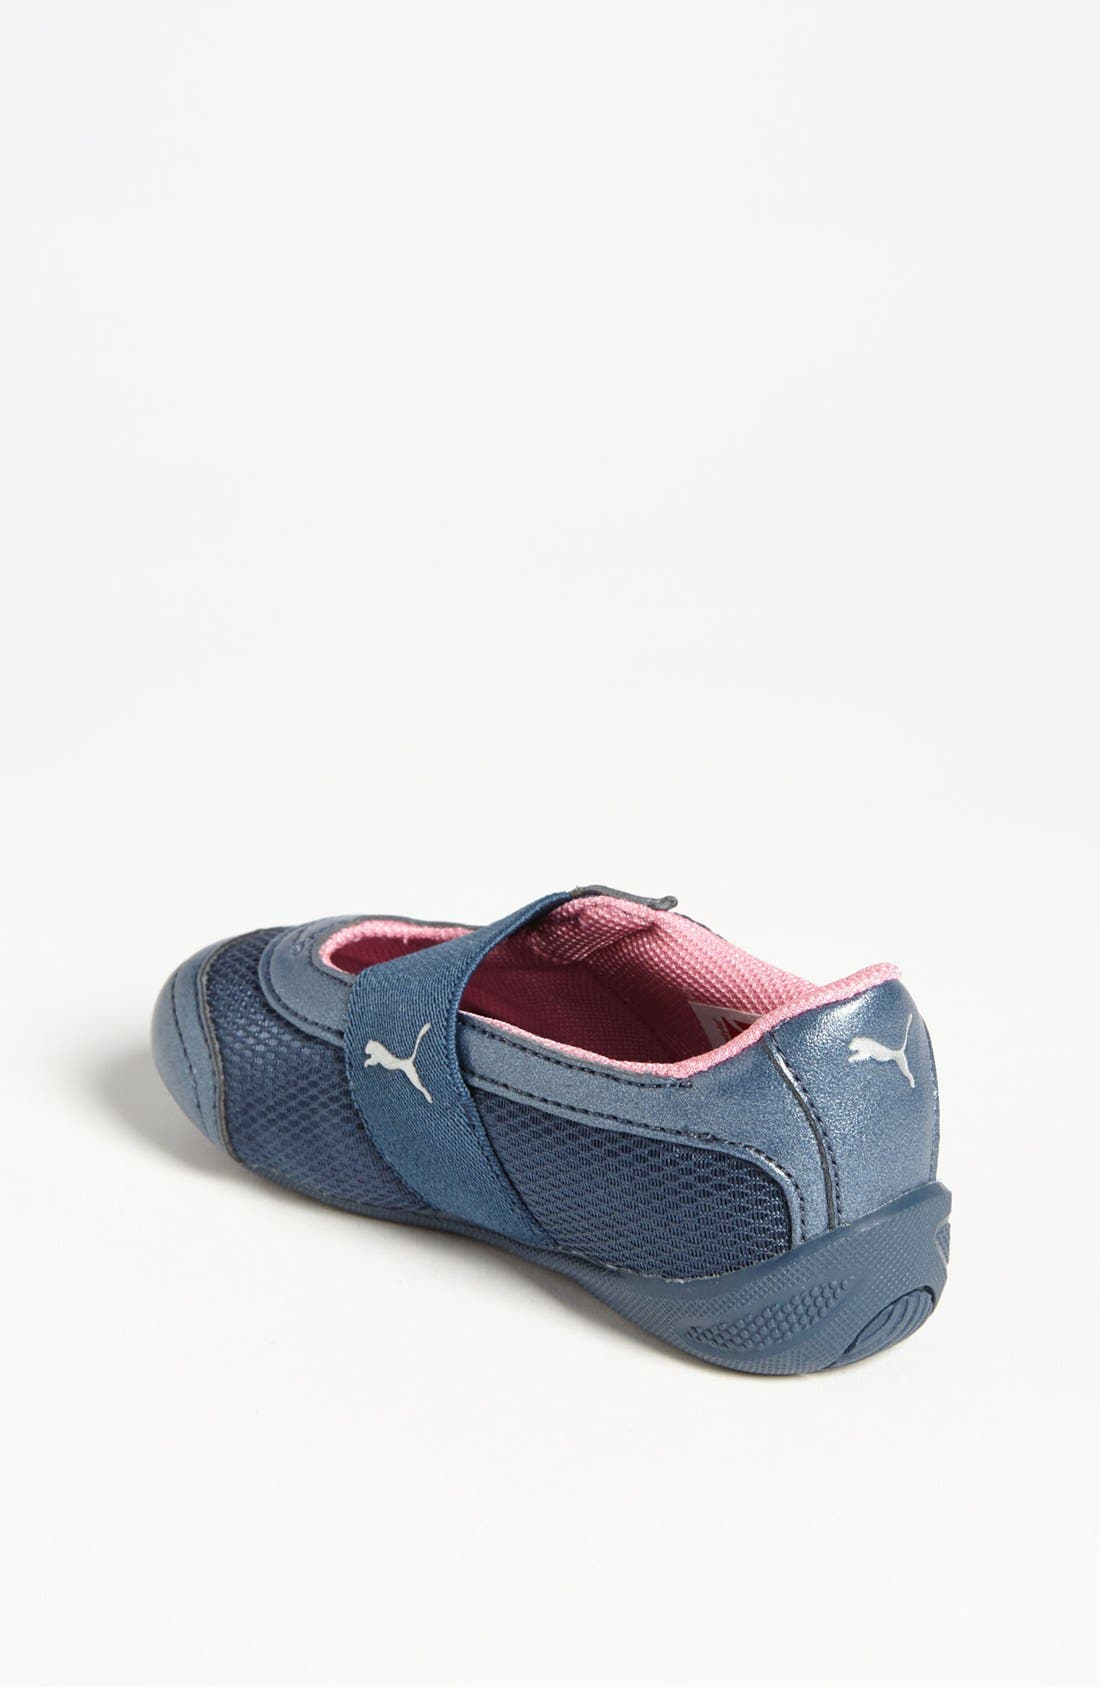 Alternate Image 2  - PUMA 'Sneakerina' Slip-On (Walker, Toddler & Little Kid)(Nordstrom Exclusive)